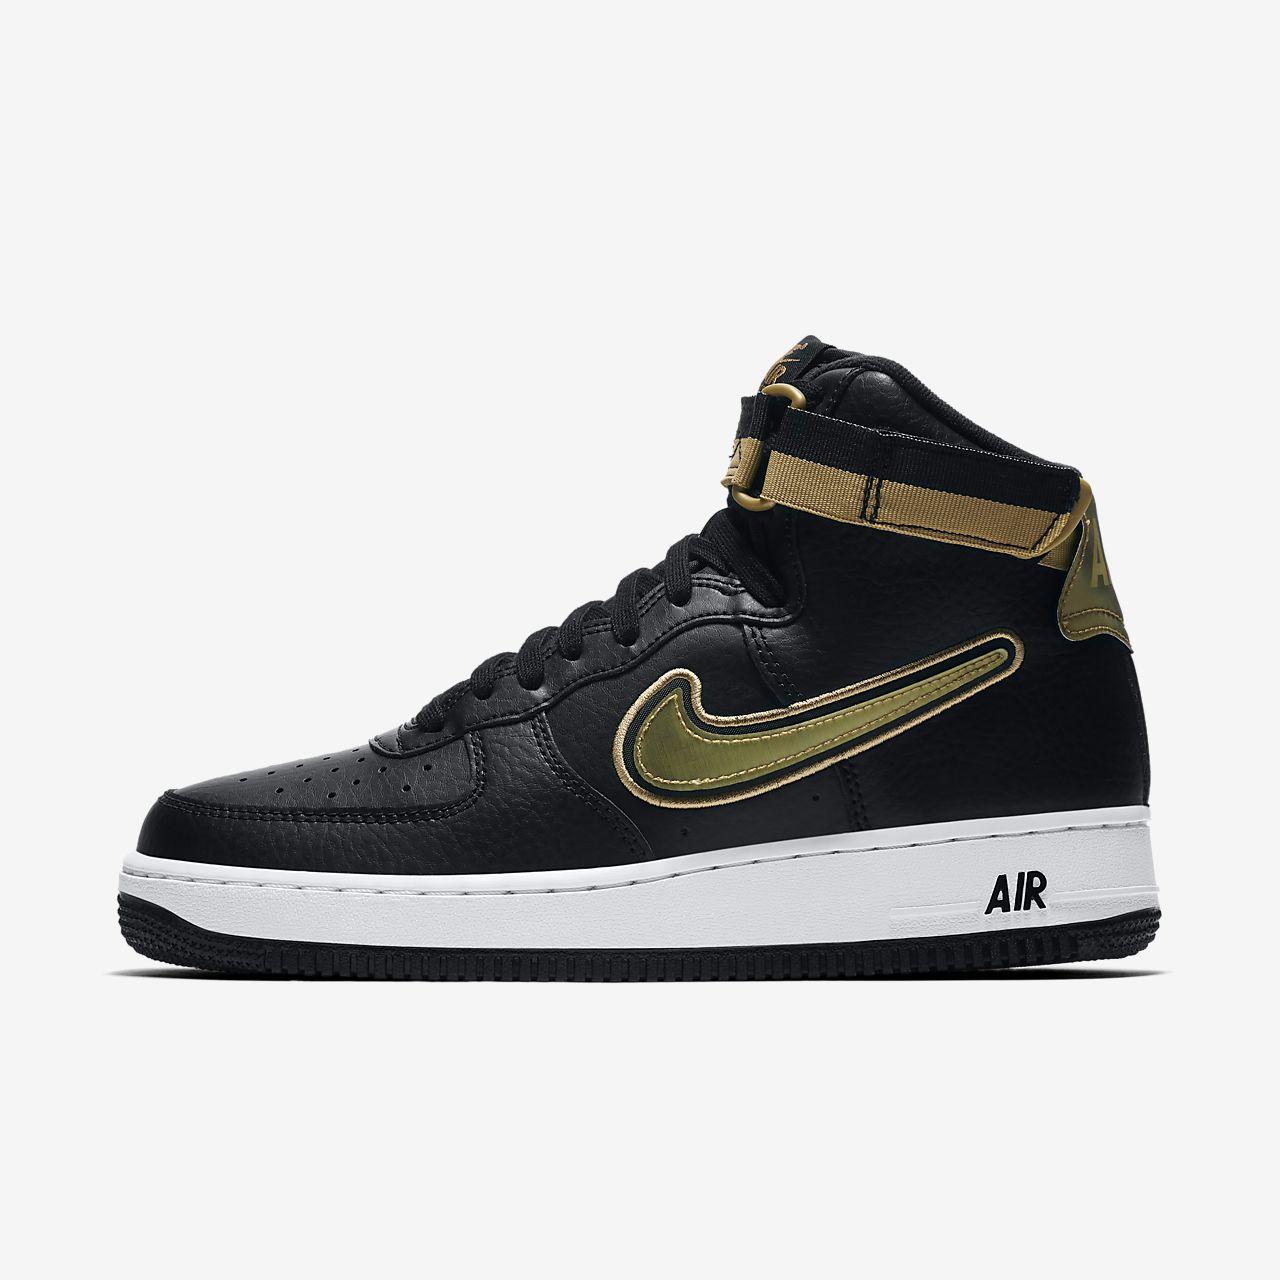 2ee369c89a1 Sapatilhas Nike Air Force 1 High  07 LV8 Sport NBA para homem. Nike ...